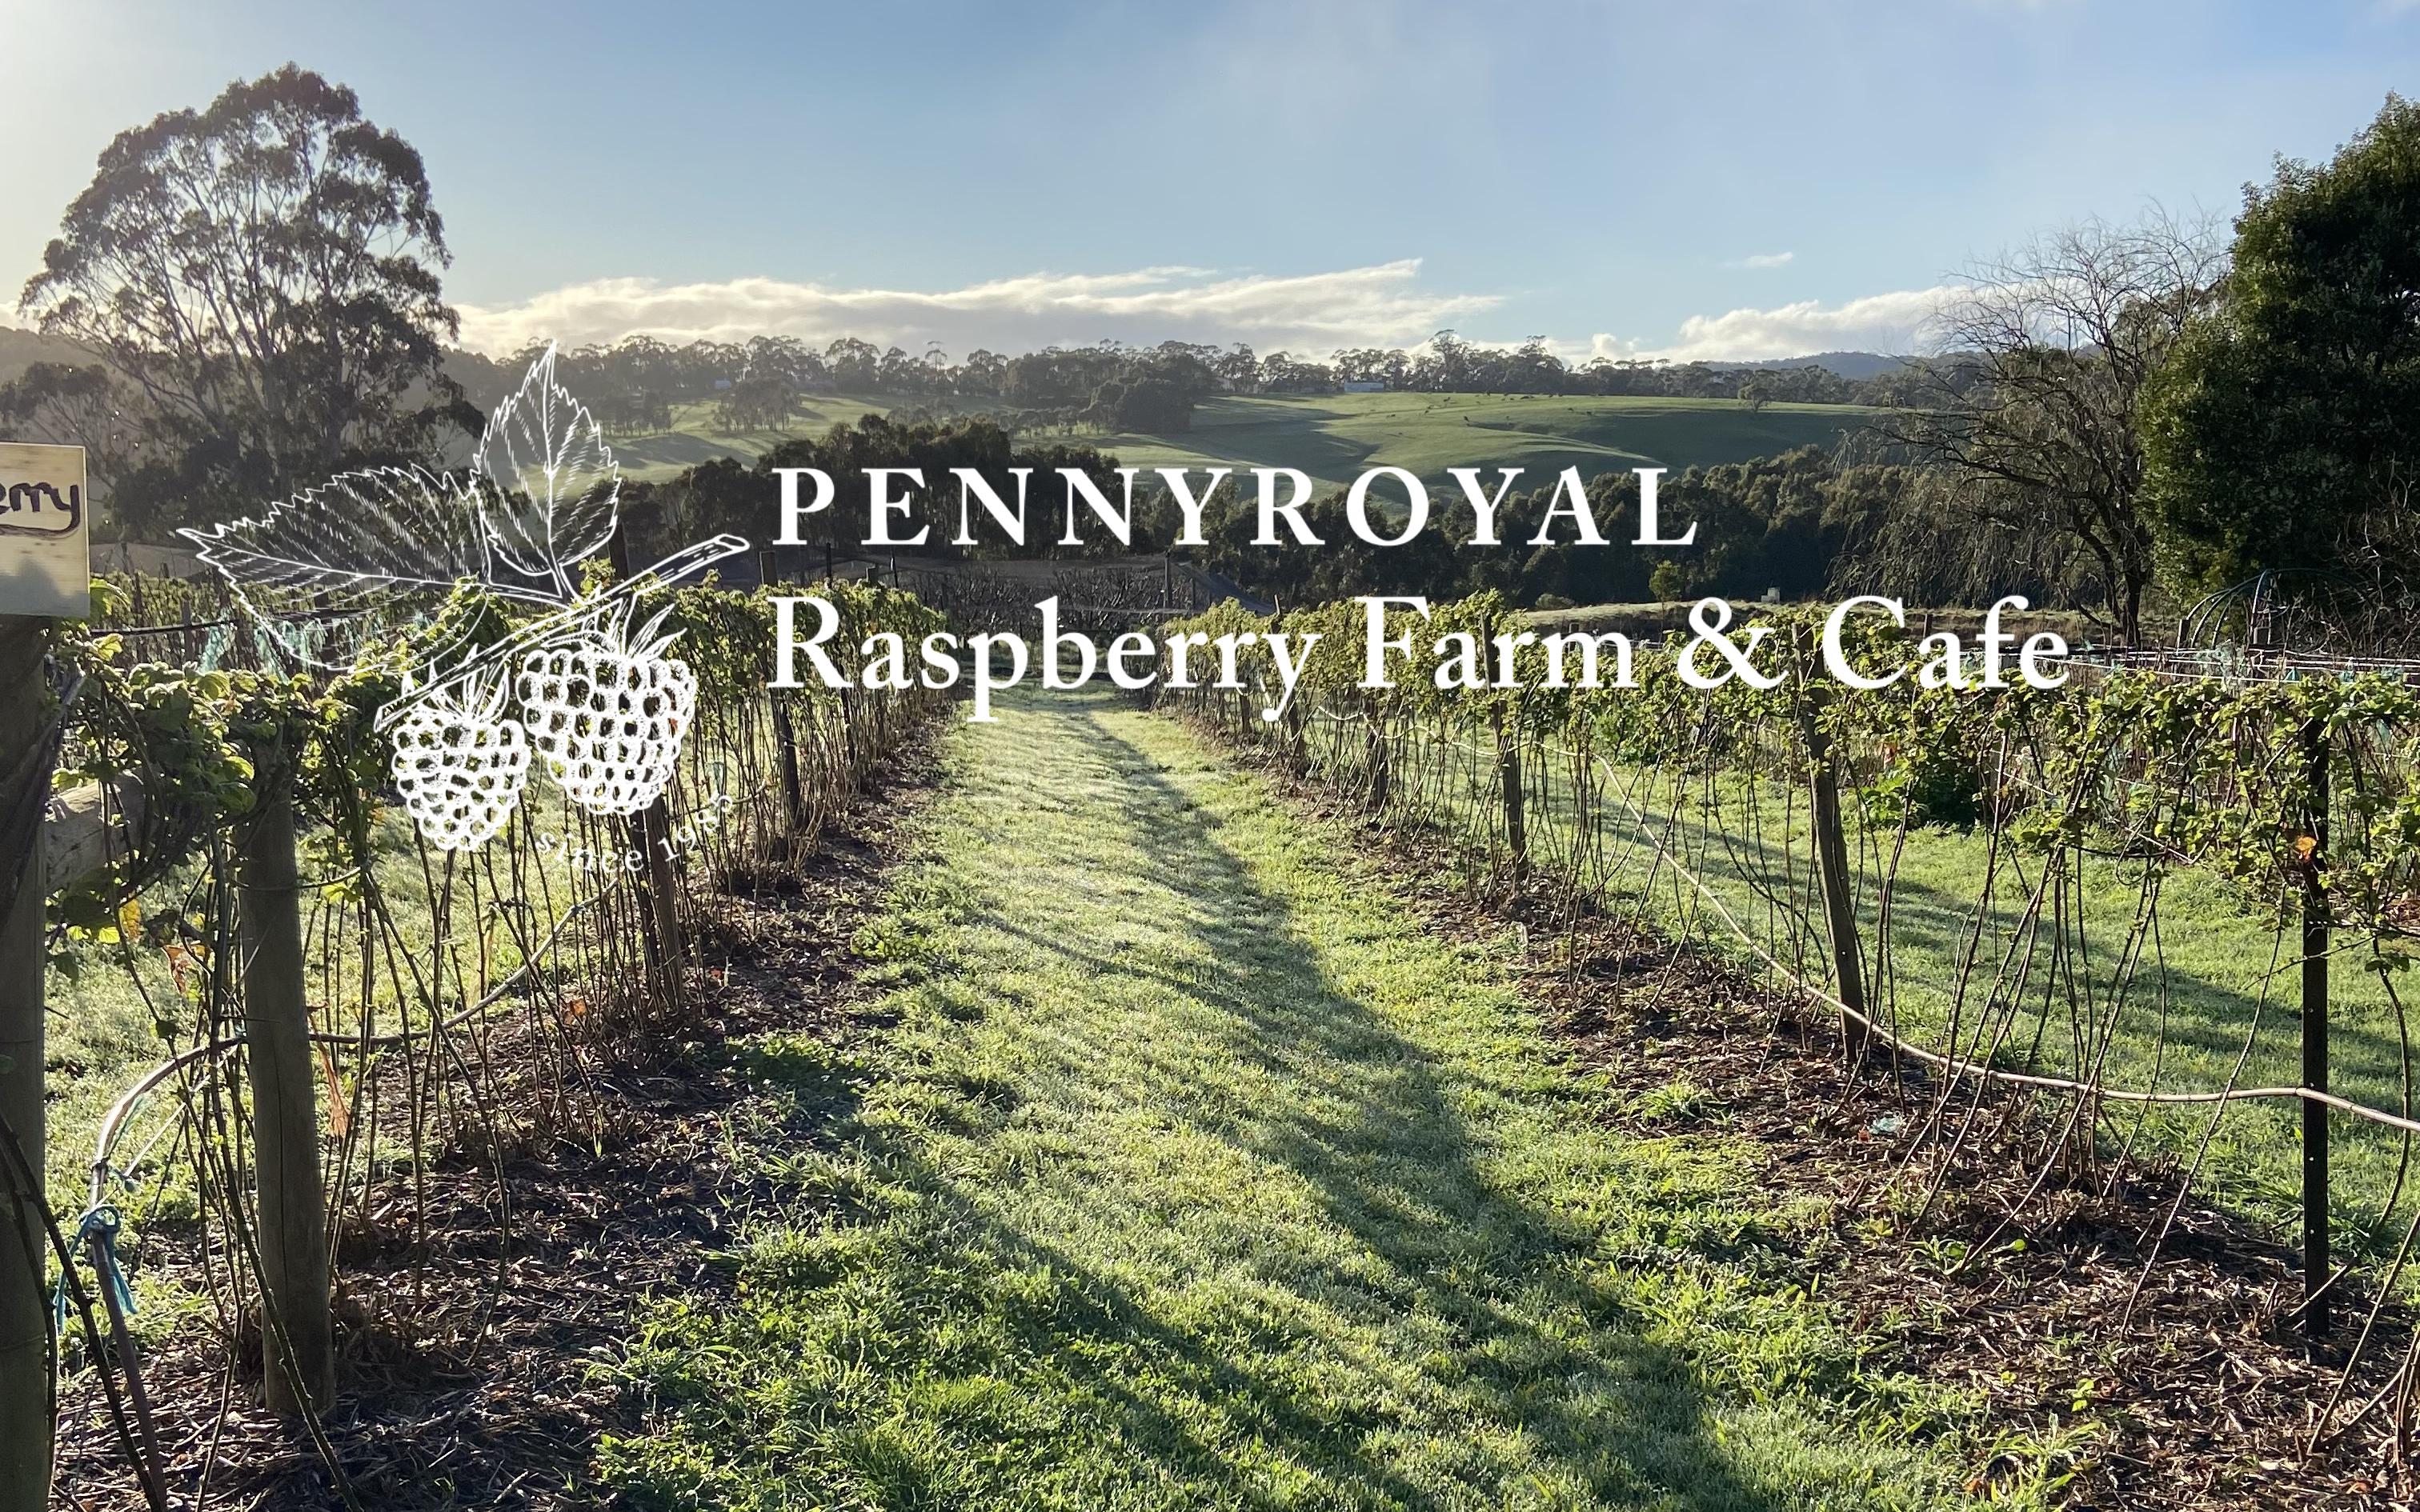 Pennyroyal Raspberry Farm